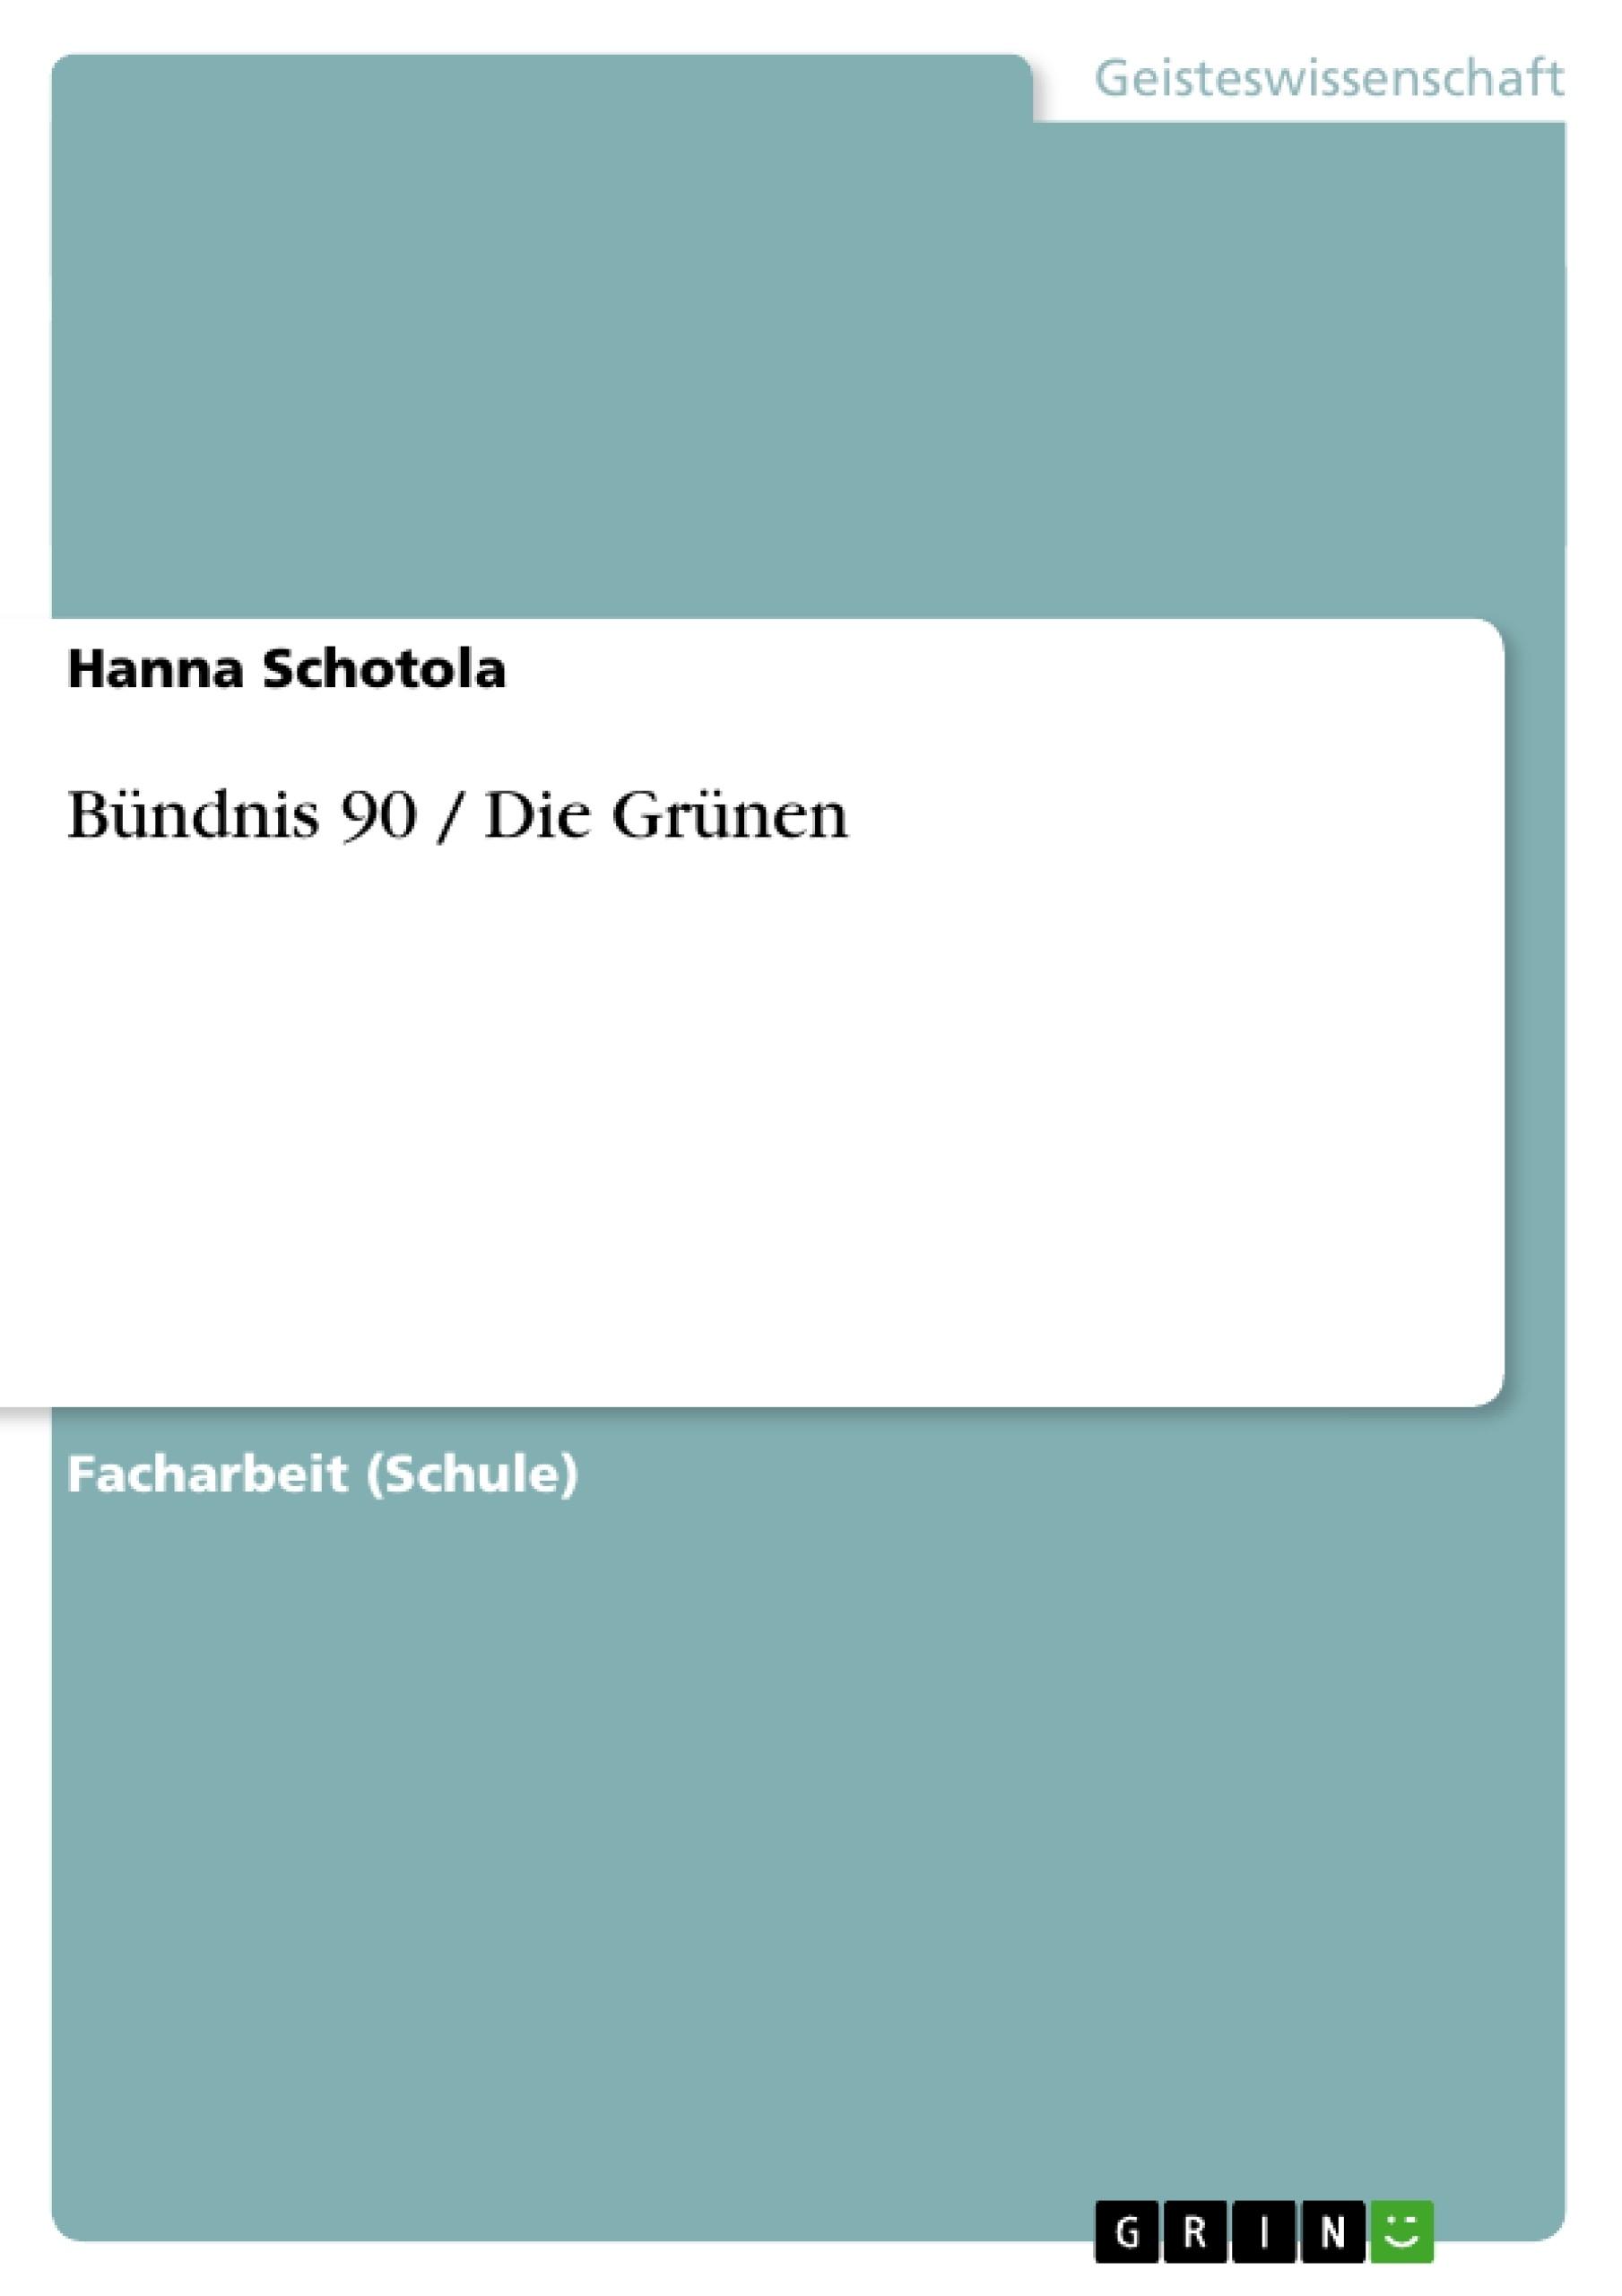 Titel: Bündnis 90 / Die Grünen